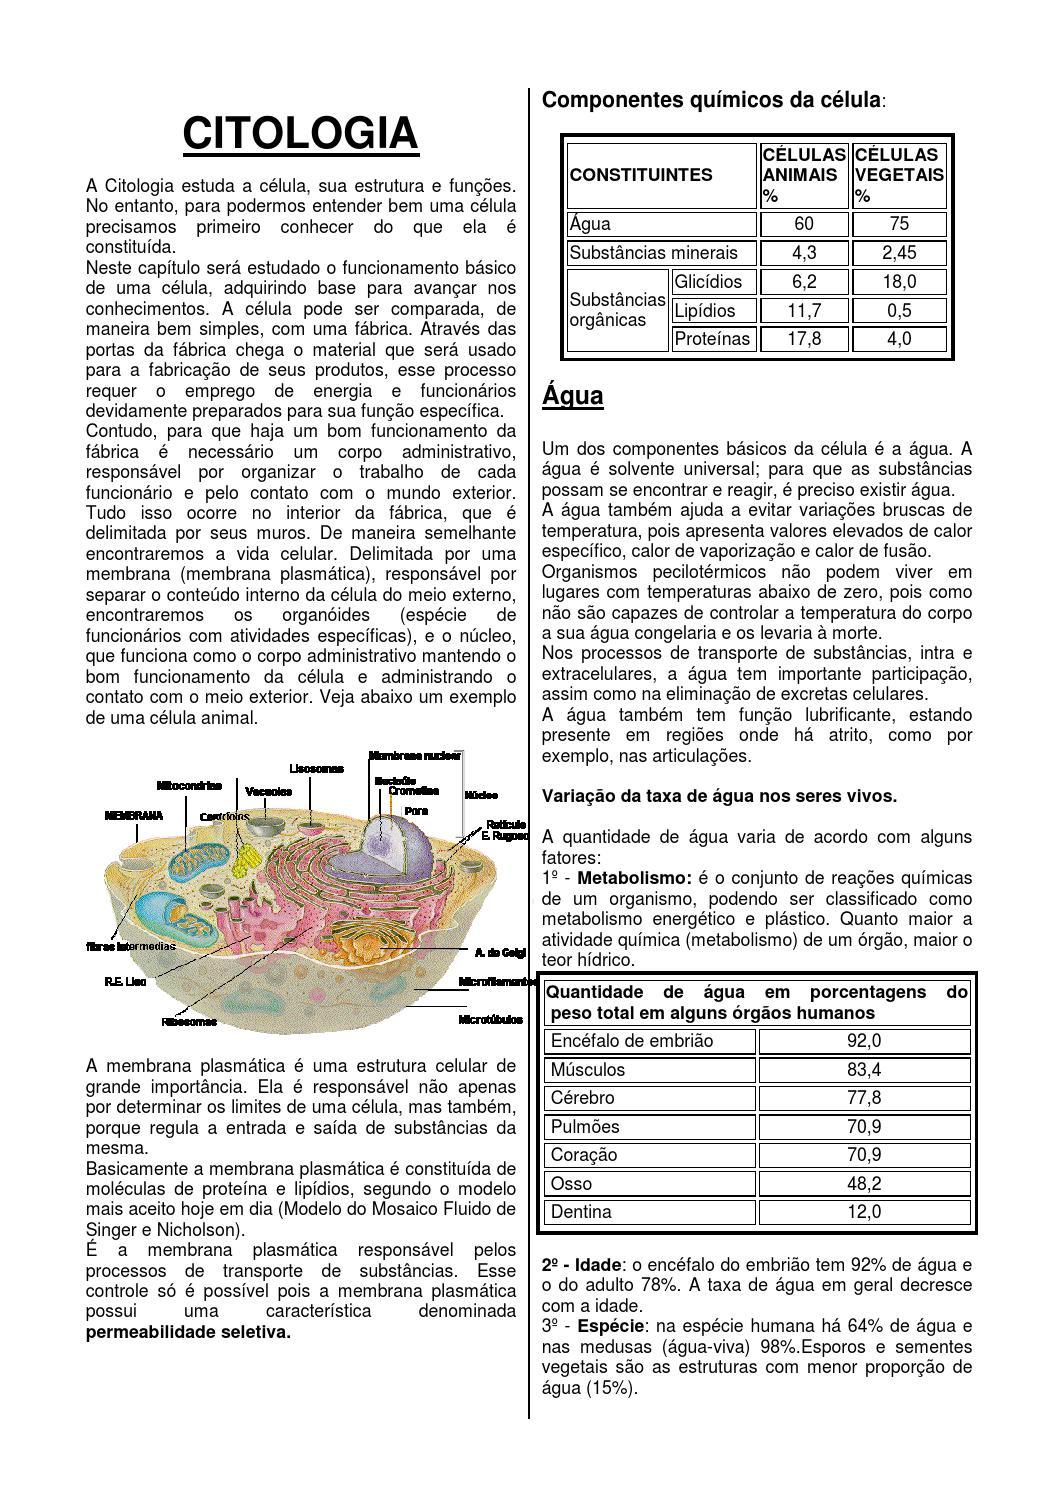 Apostila biologia celular by Roberto Azevedo - Issuu